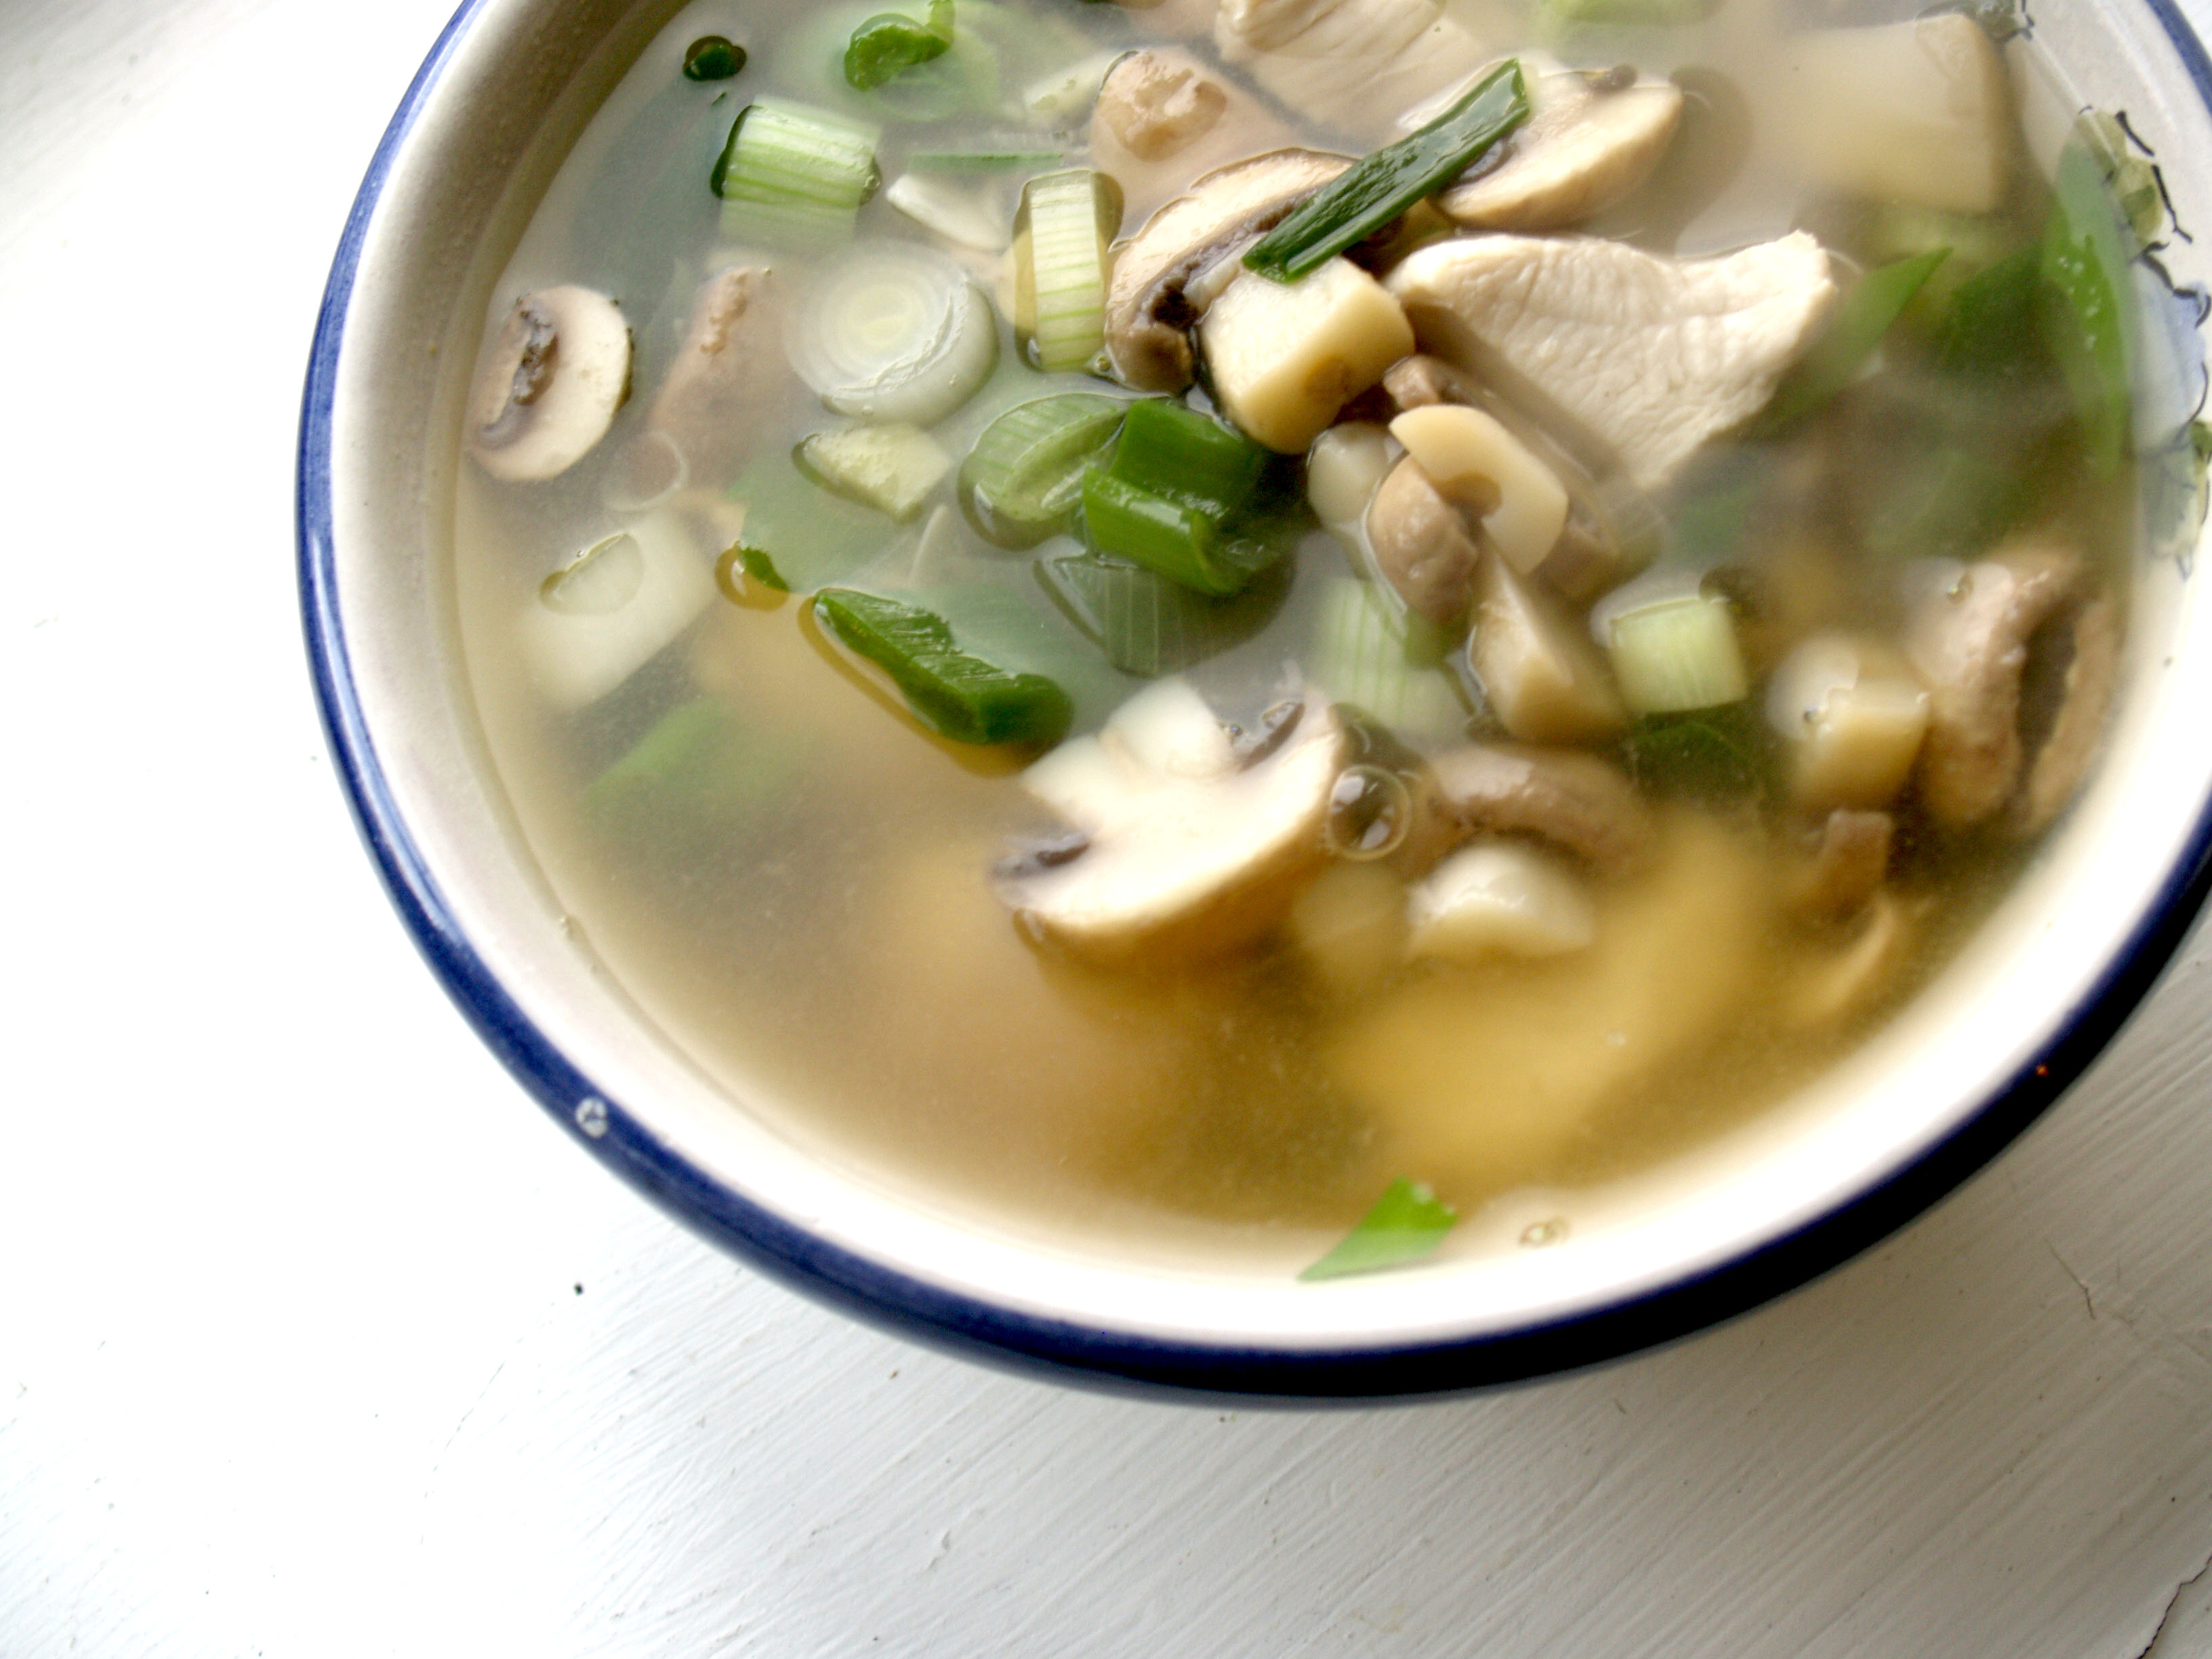 Fileflickr Cyclonebill Suppe Med Kylling Svampe Og Forårsløg